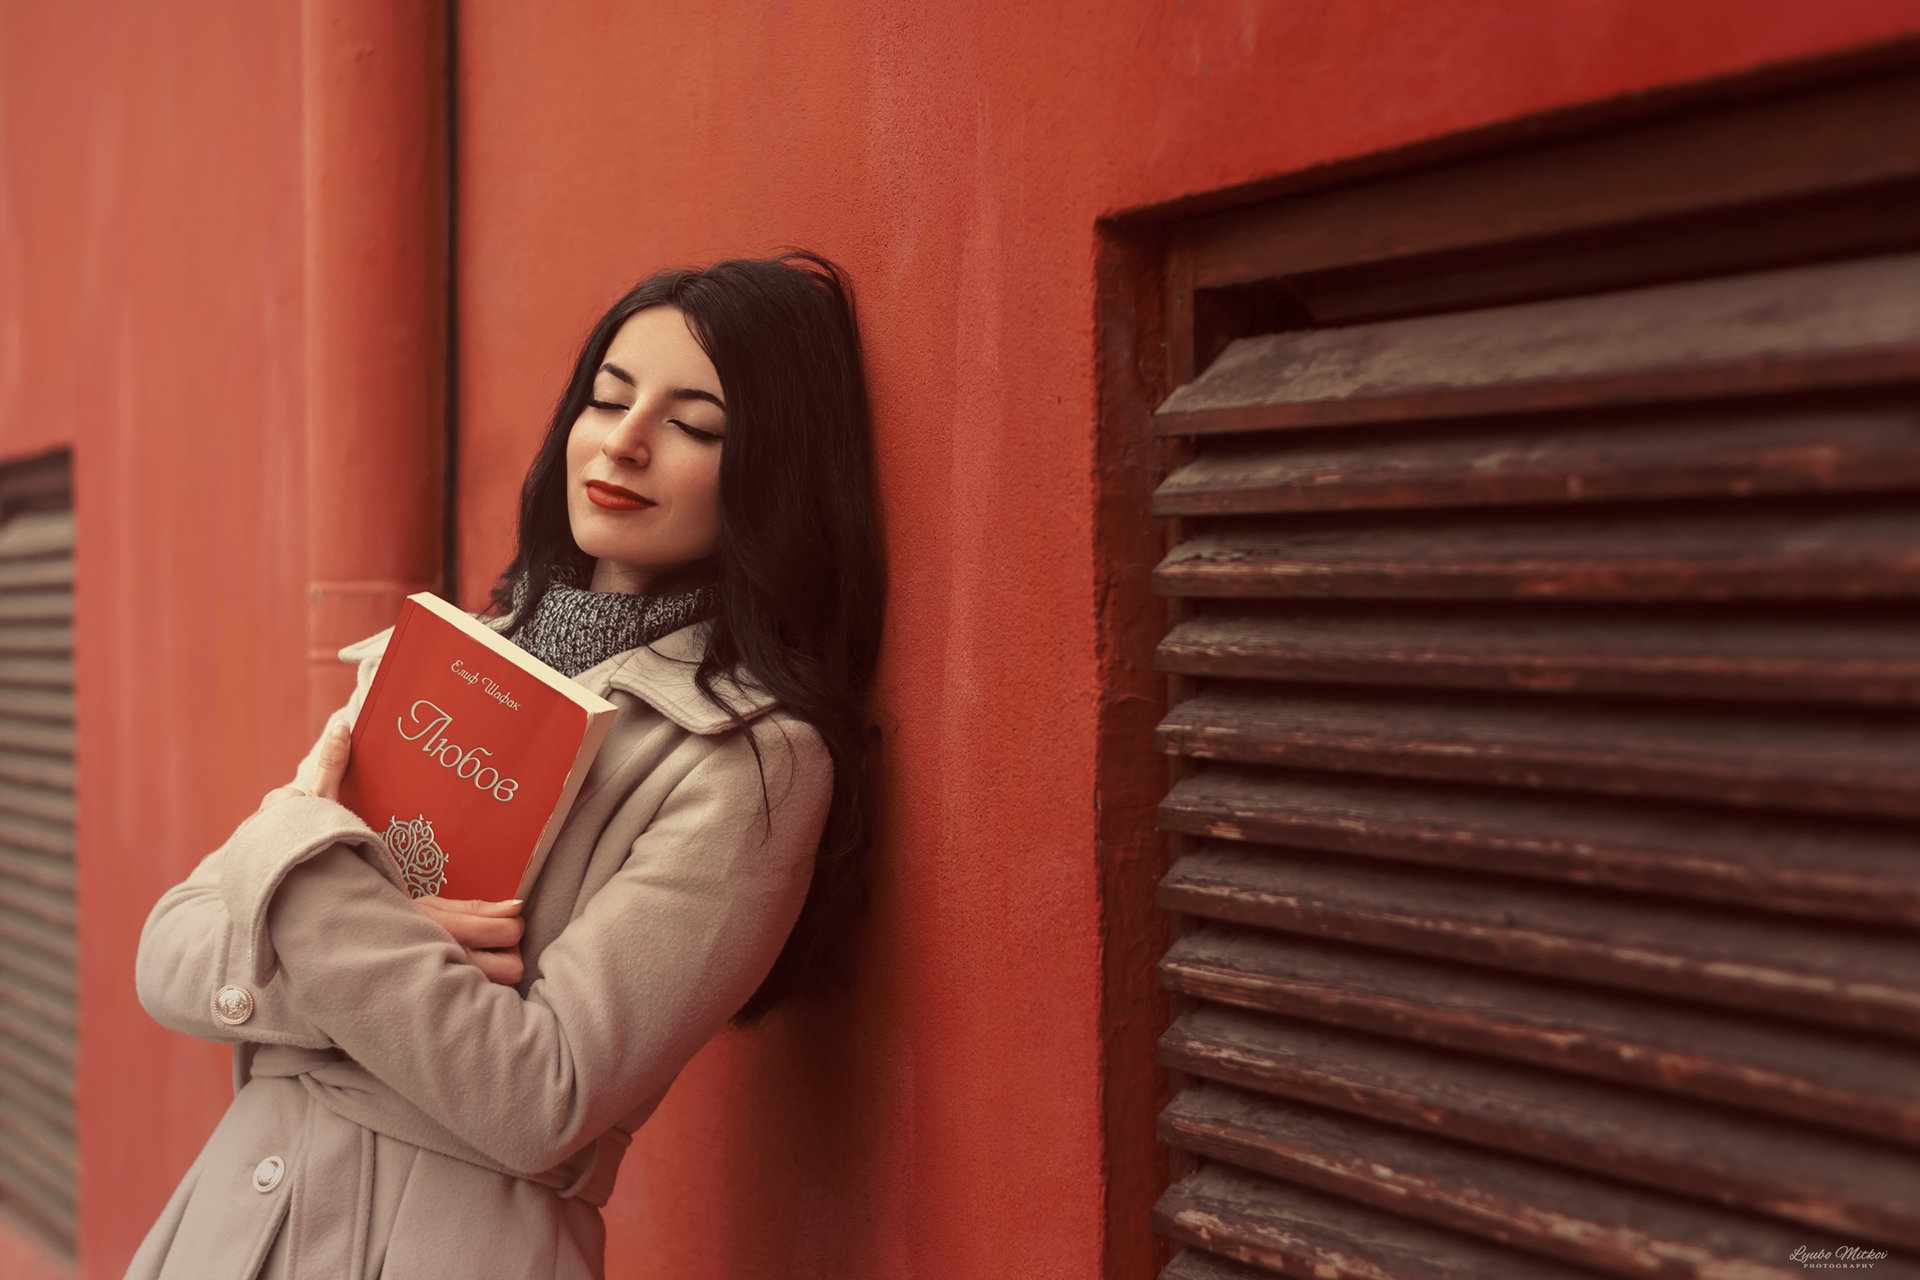 Reading is love | Author Любомир Митков - psiho91 | PHOTO FORUM